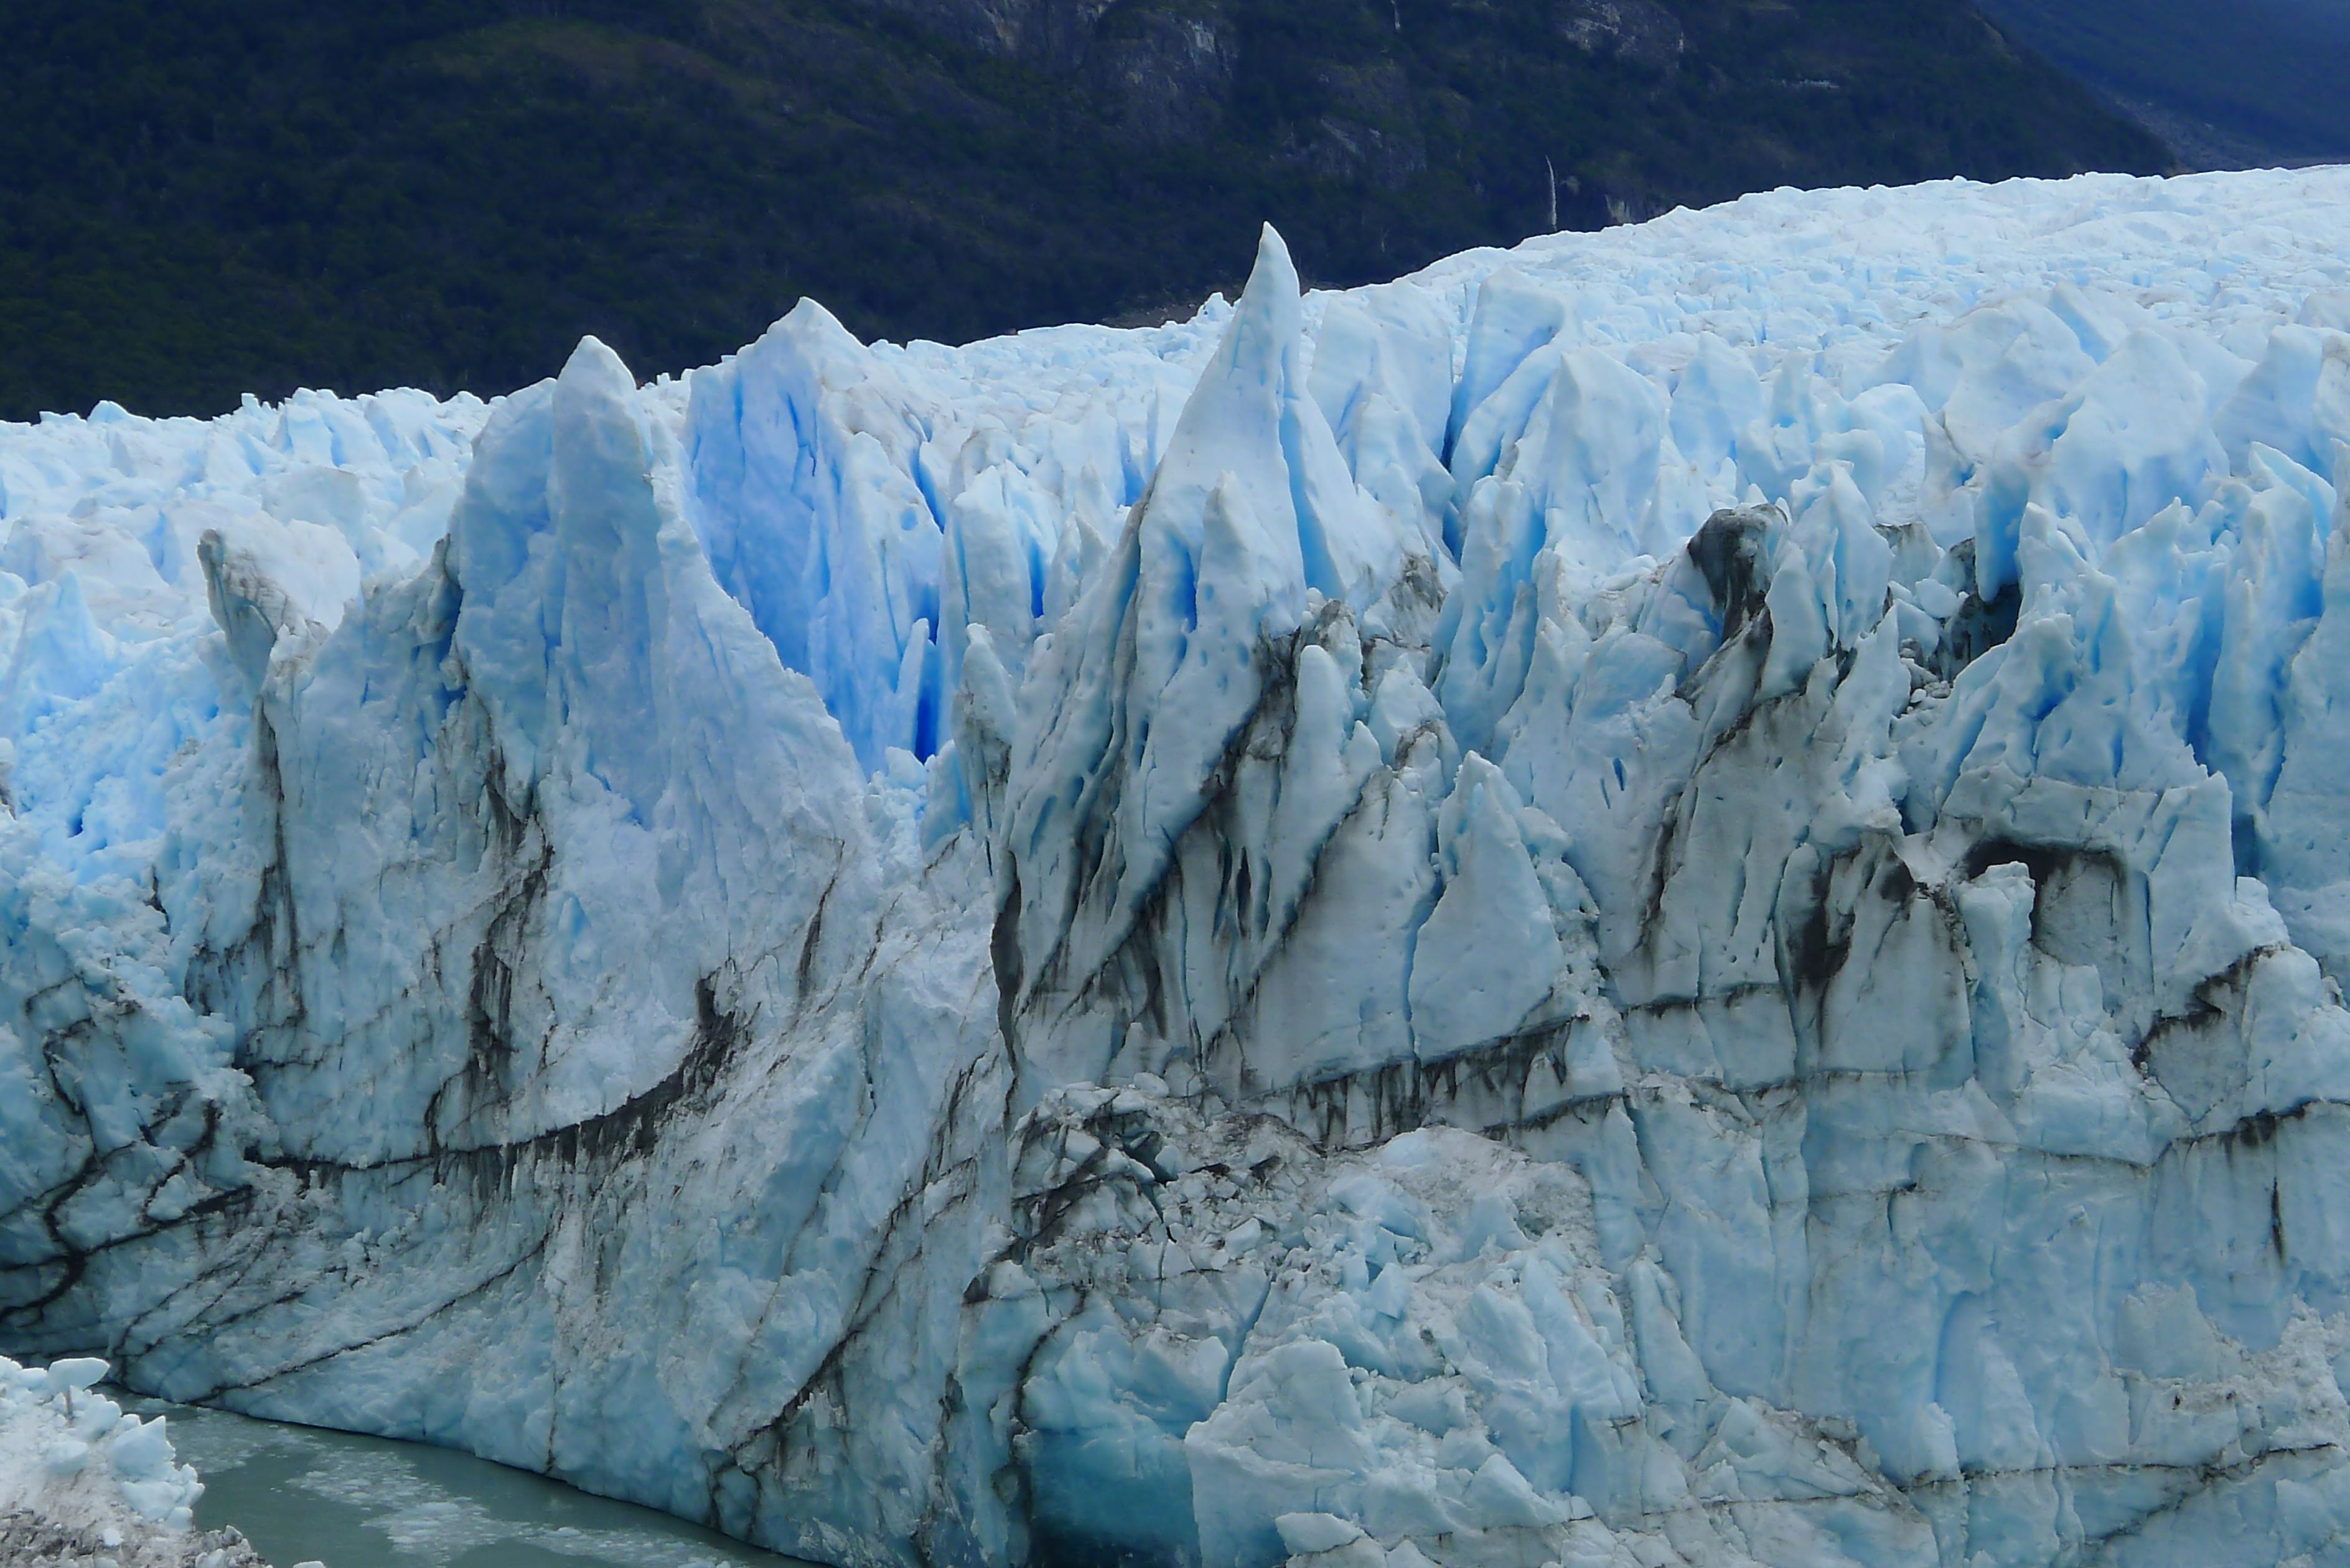 Patagonia slimpaley.com